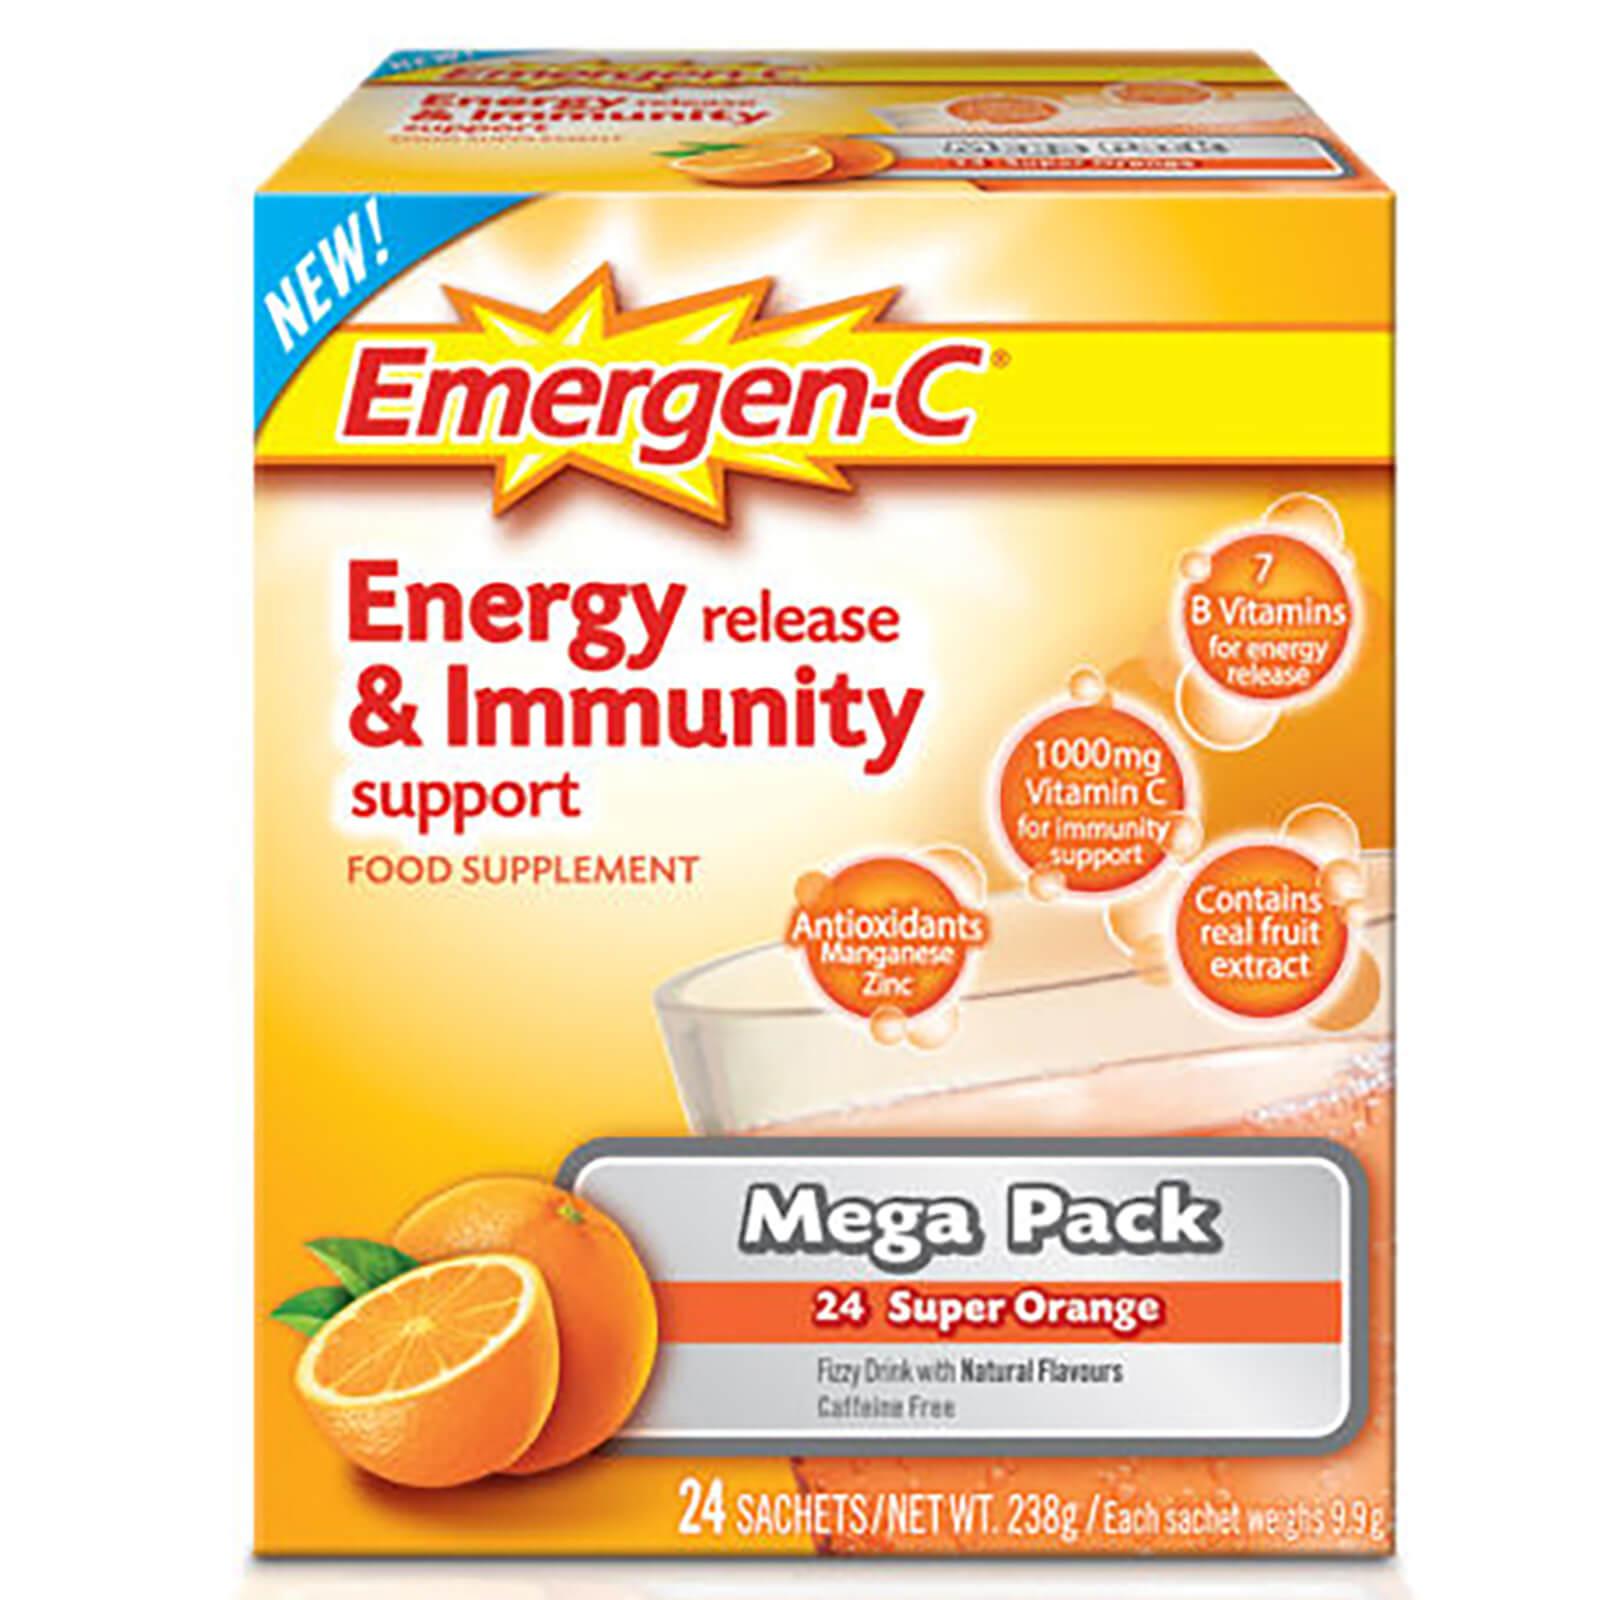 Emergen C Orange Pack Mega 24 Servings Beautyexpert Natural Cotton Ultra Slim Overnight 4s Product Description